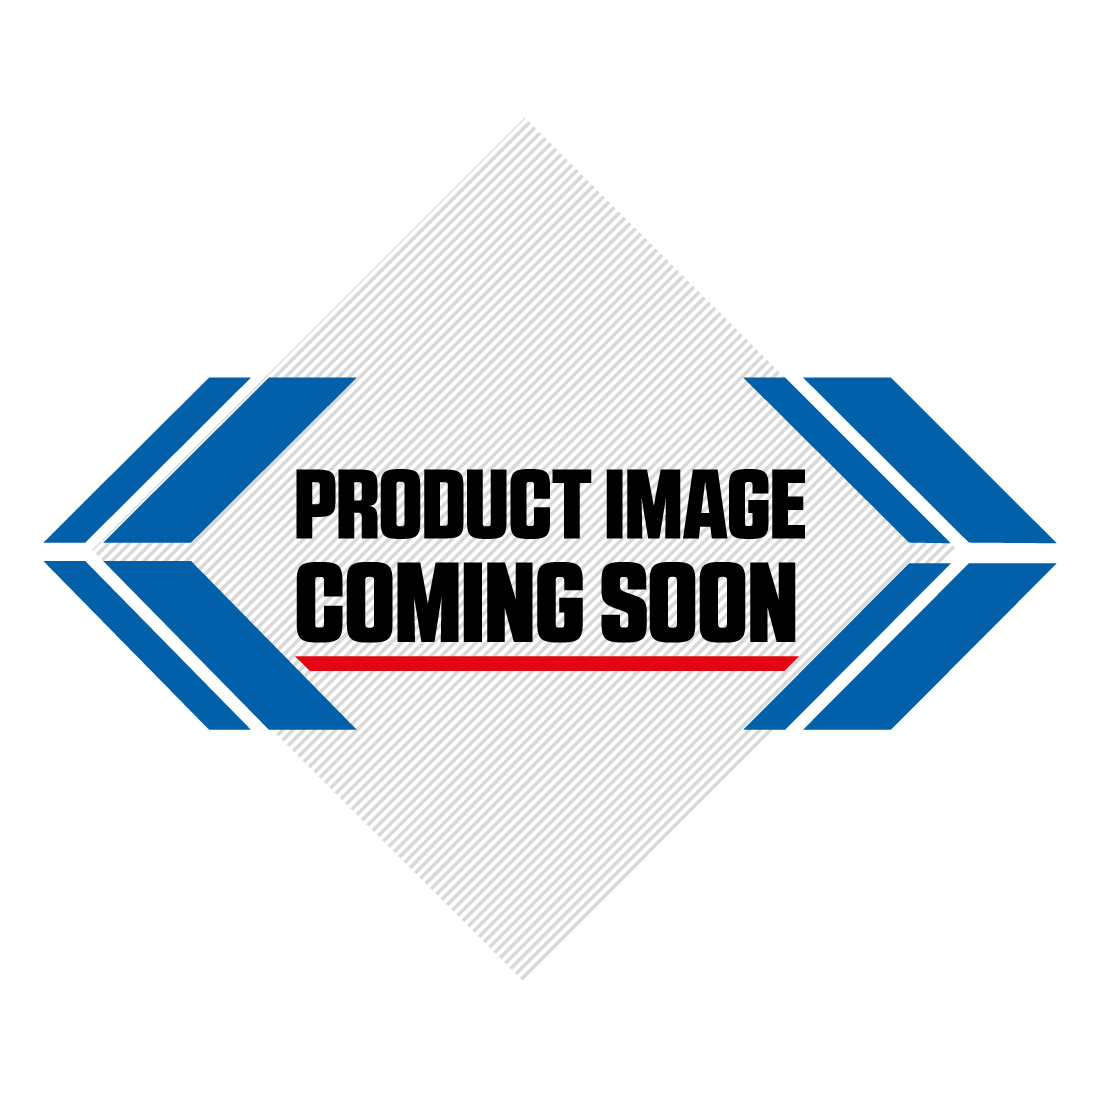 DJI Mavic Pro Fly More Combo 4K Quadcopter Drone Image-1>